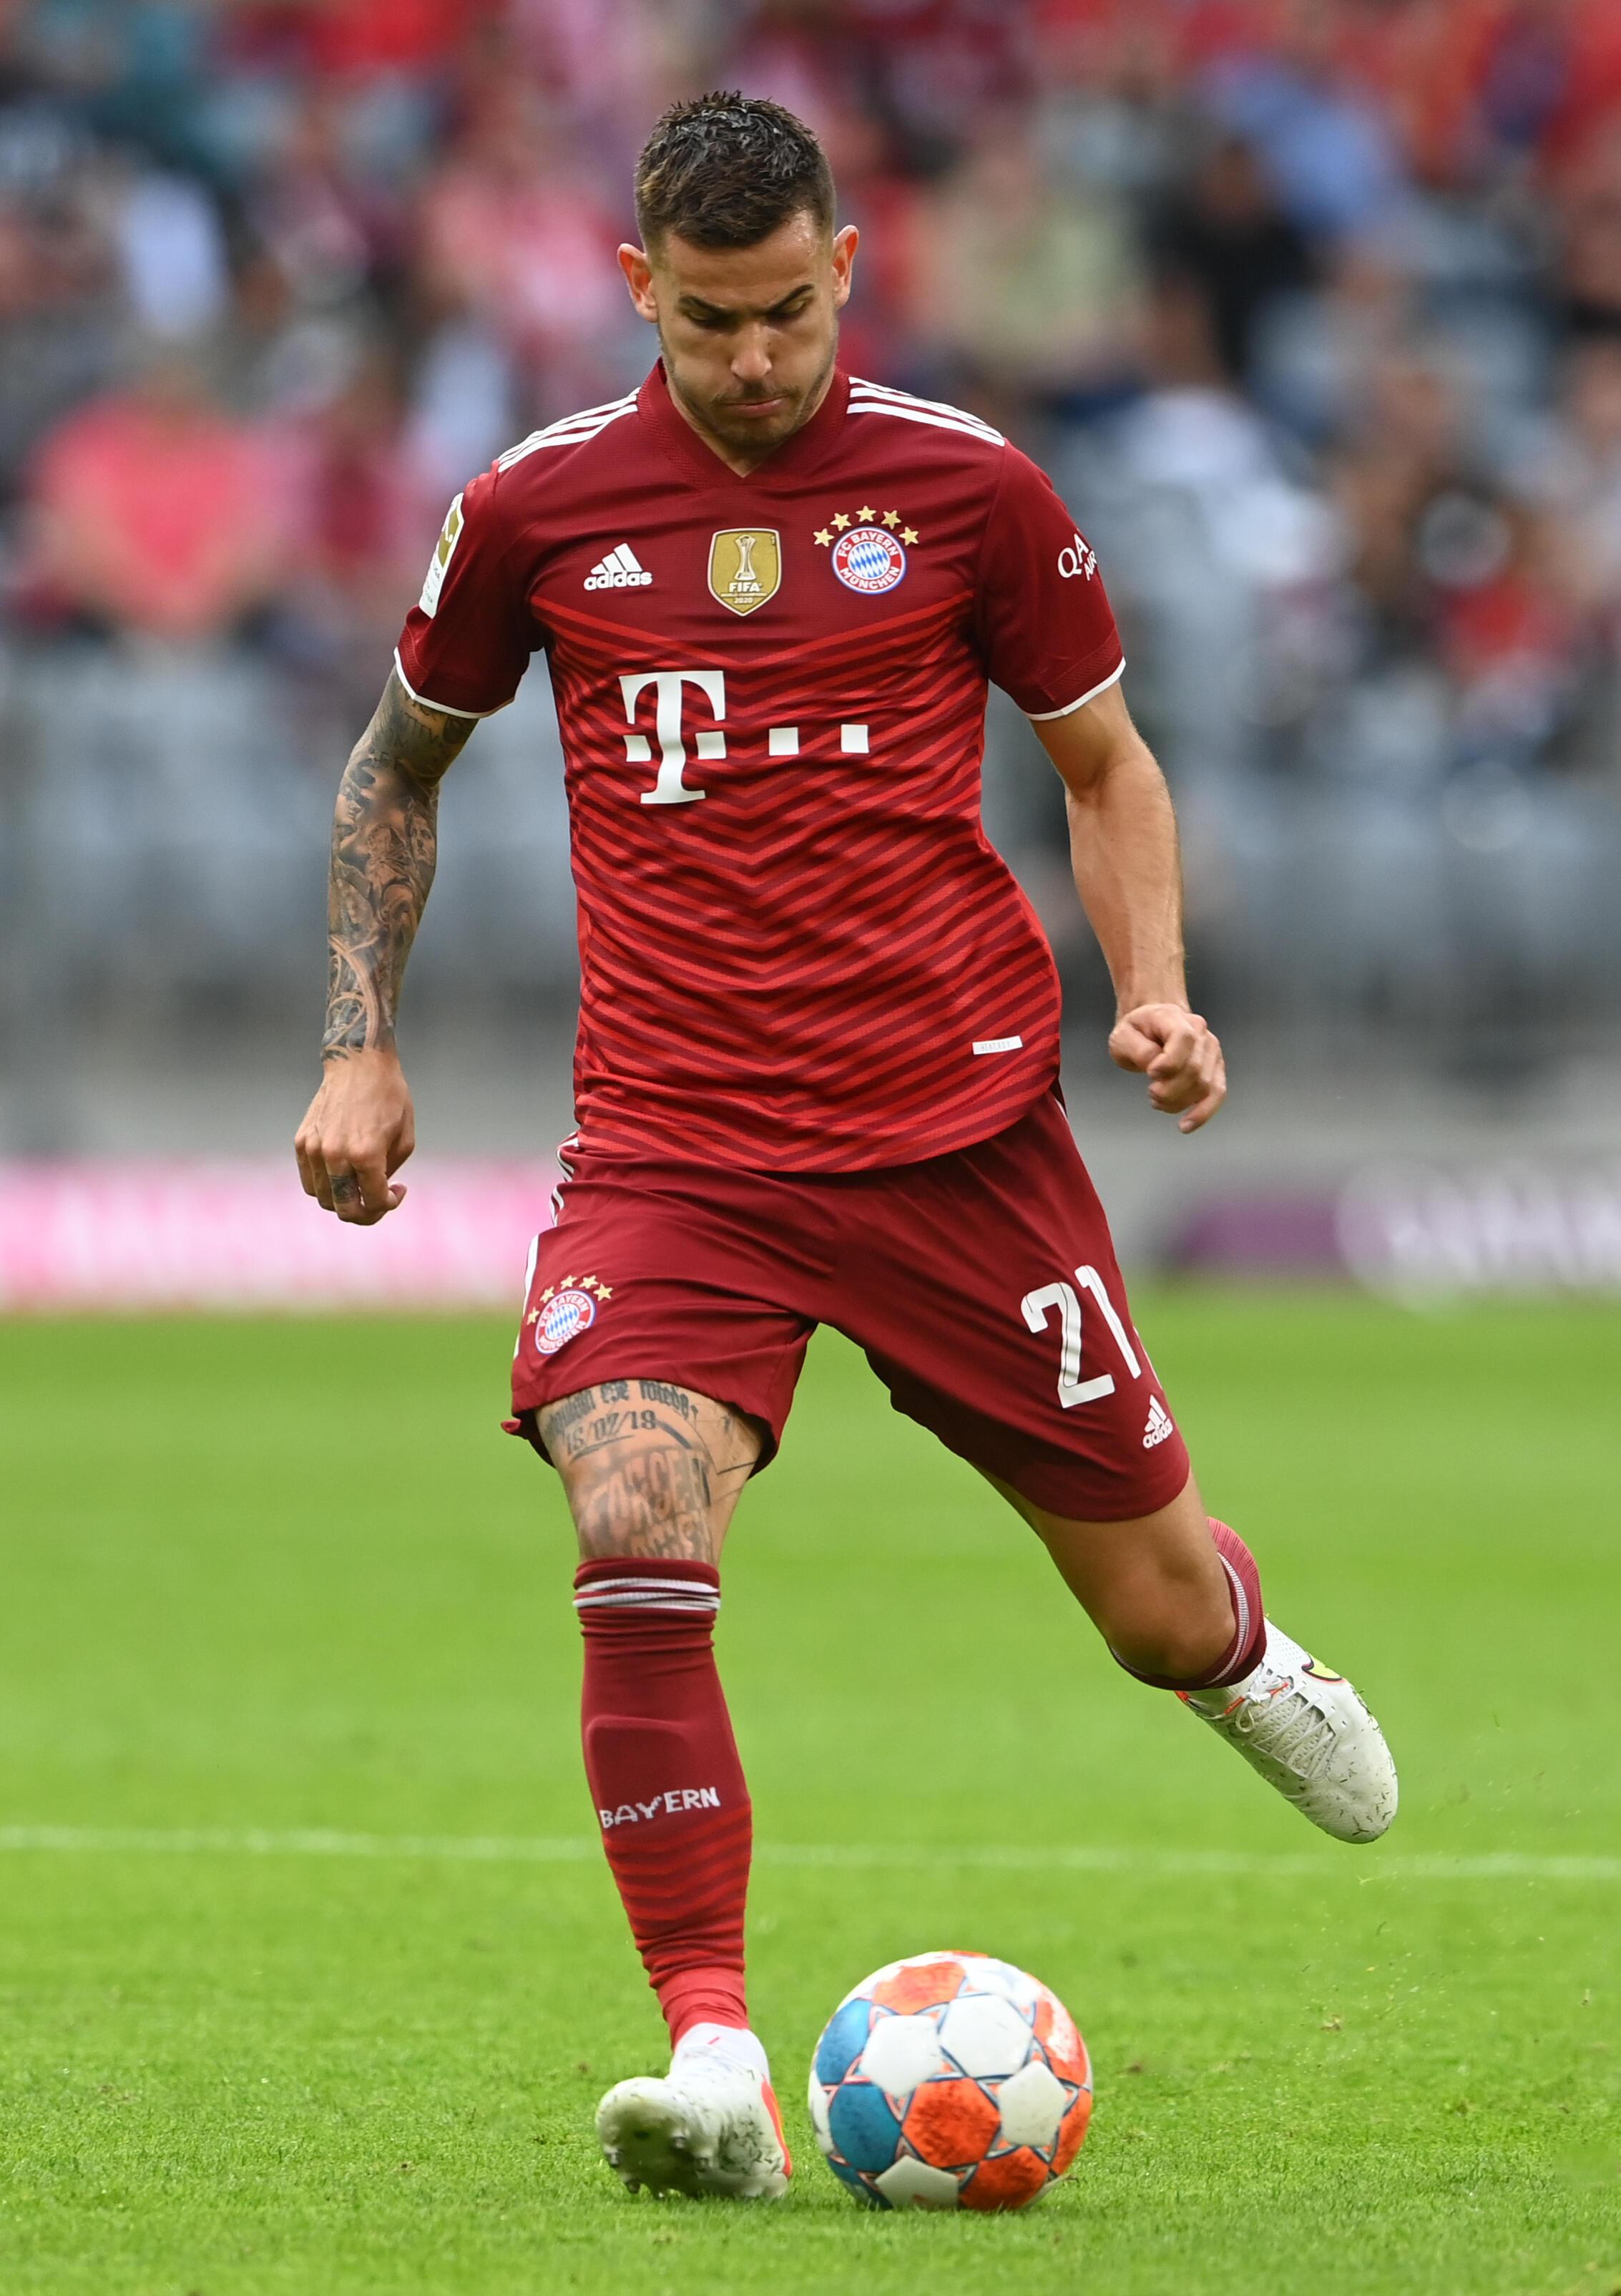 French Bayern Munich defender Lucas Hernandez during the Bundesliga meeting between Bayern and Eintracht Frankfurt in Munich on October 3, 2021